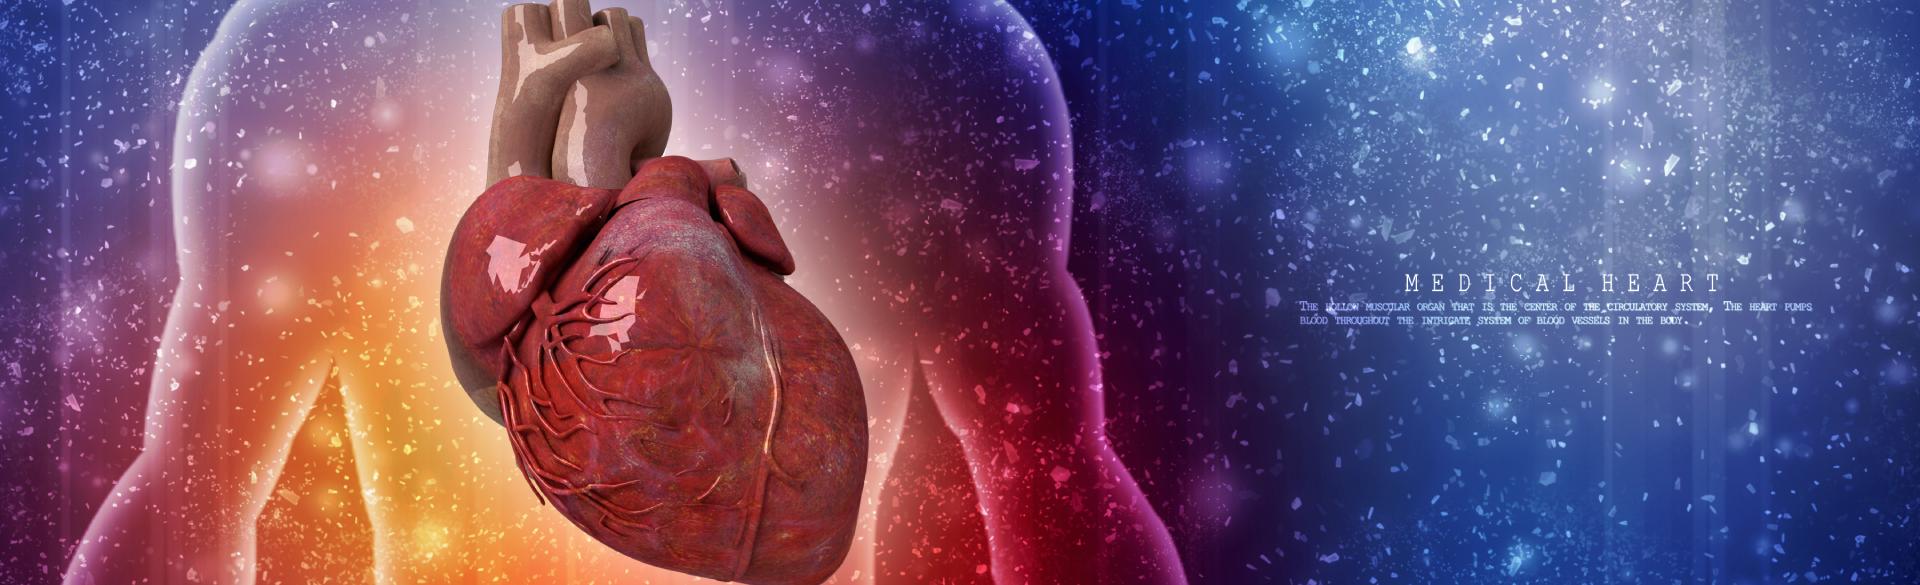 intesnse-light-prevents-heart-attack